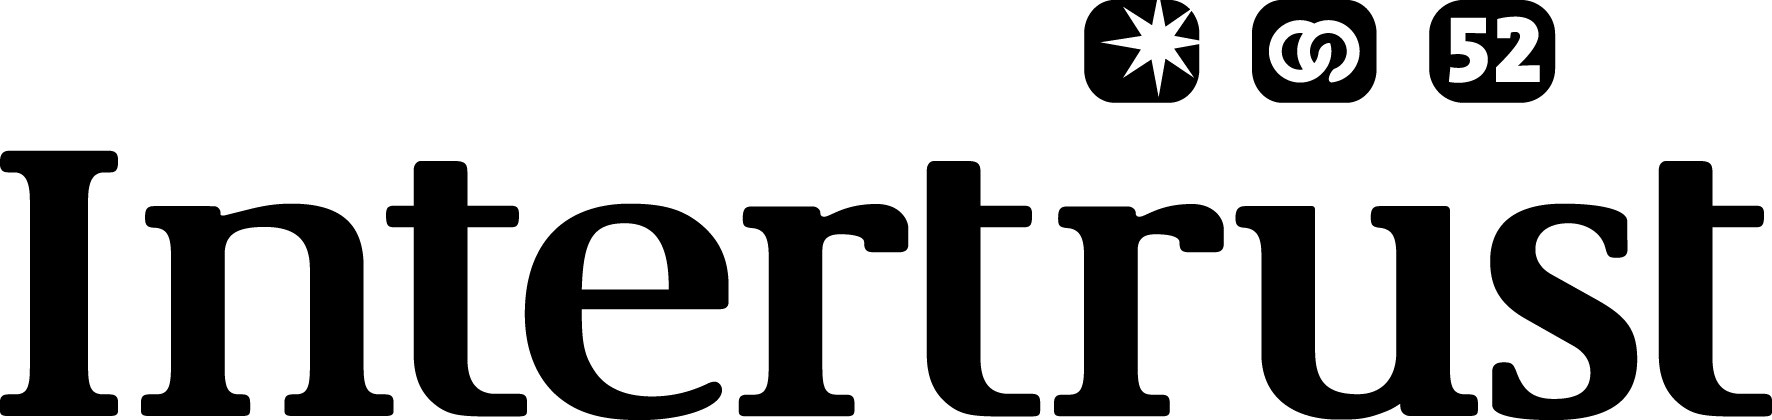 Intertrust_logo JPG